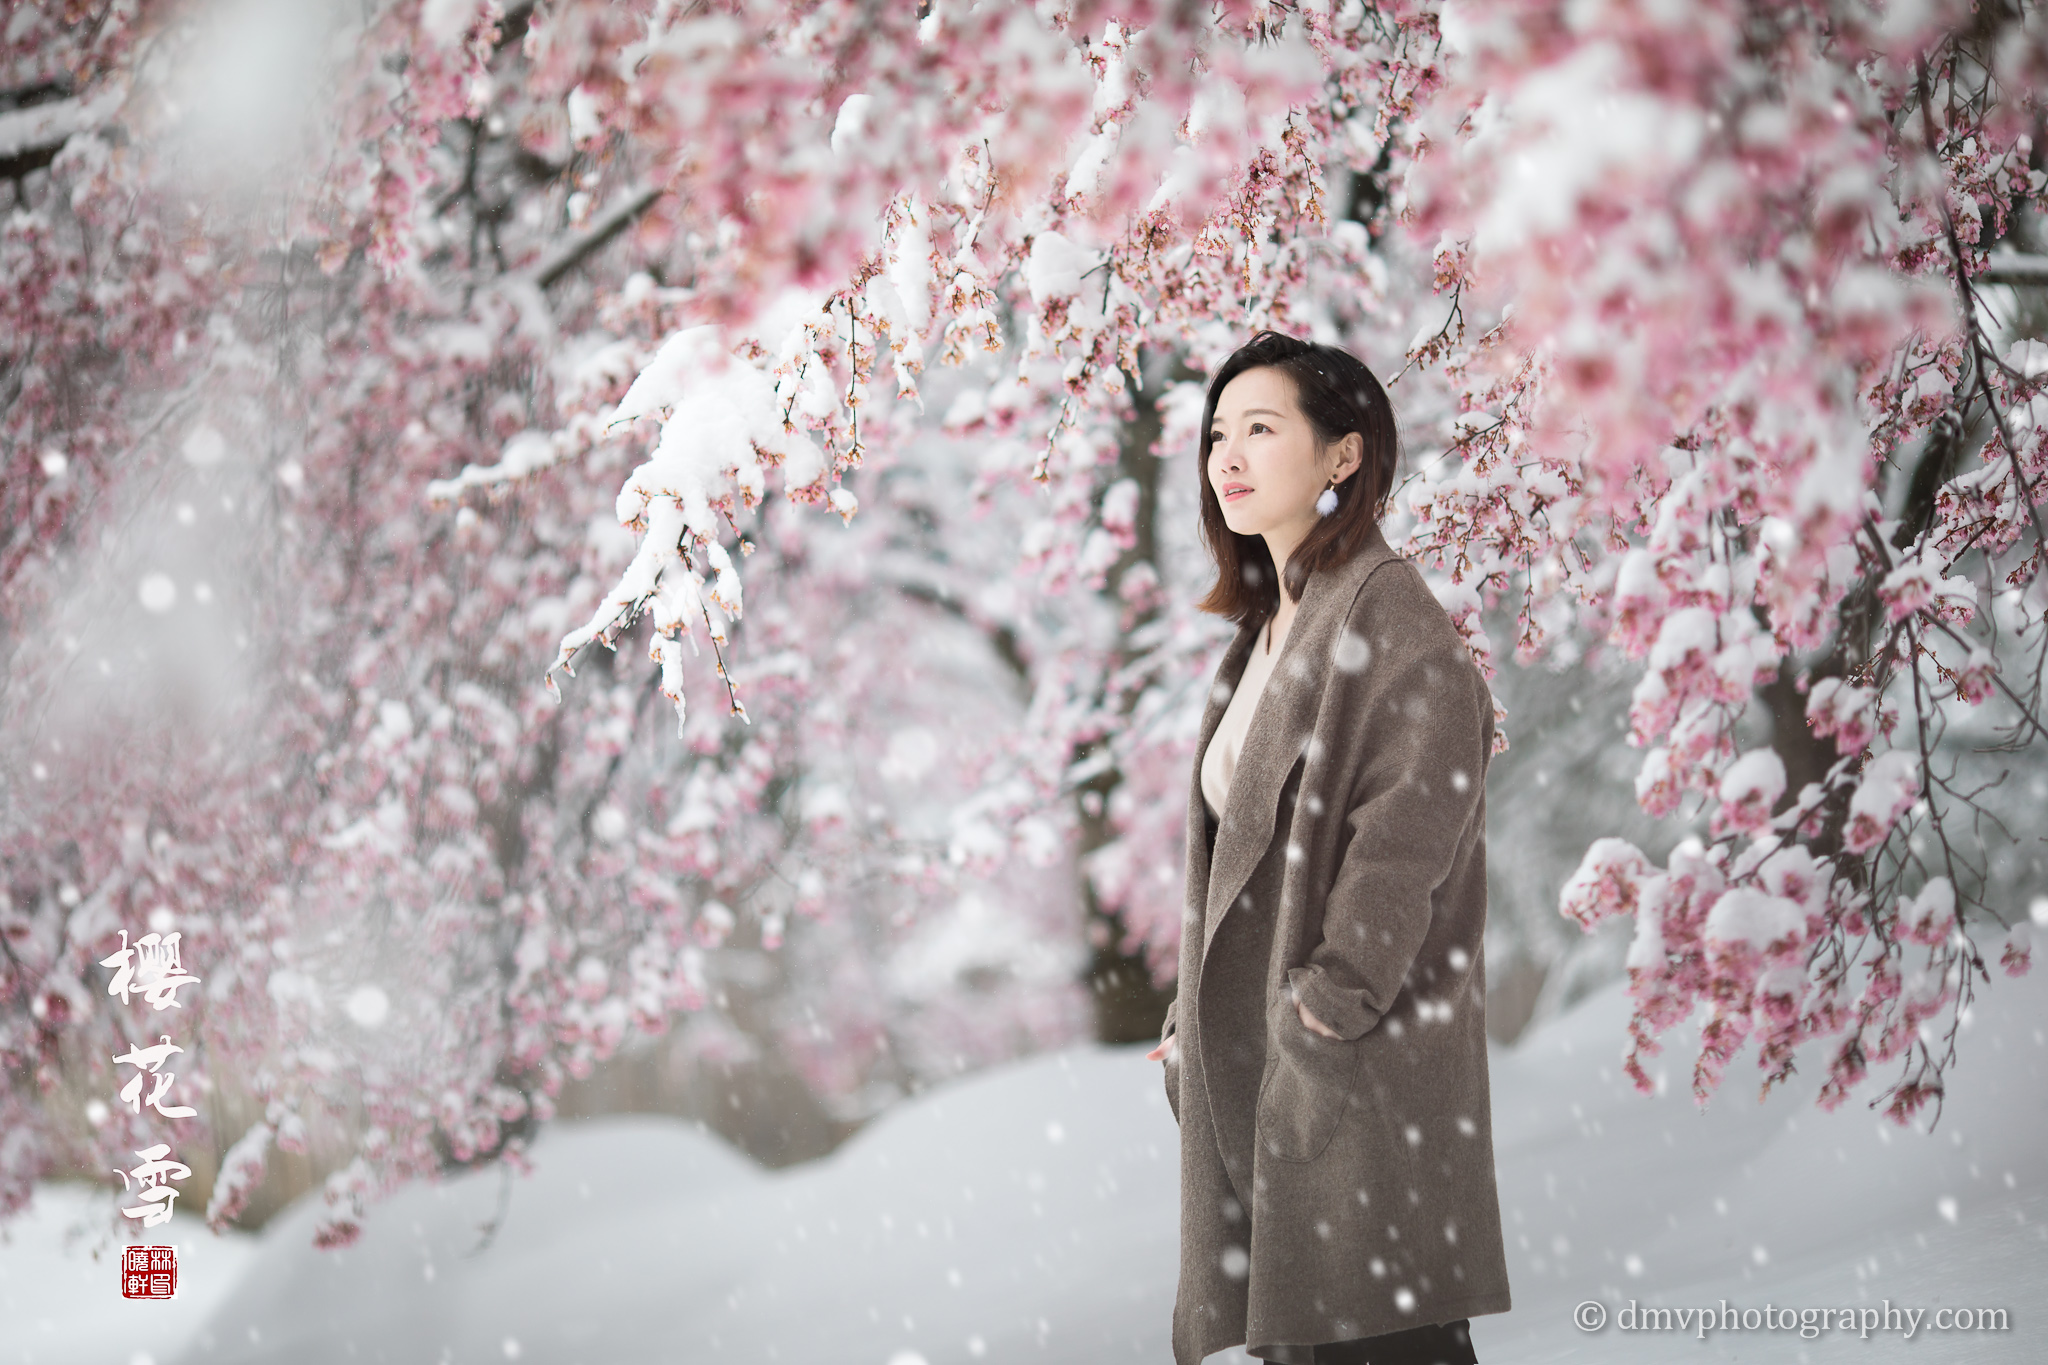 _D4_8272-snow